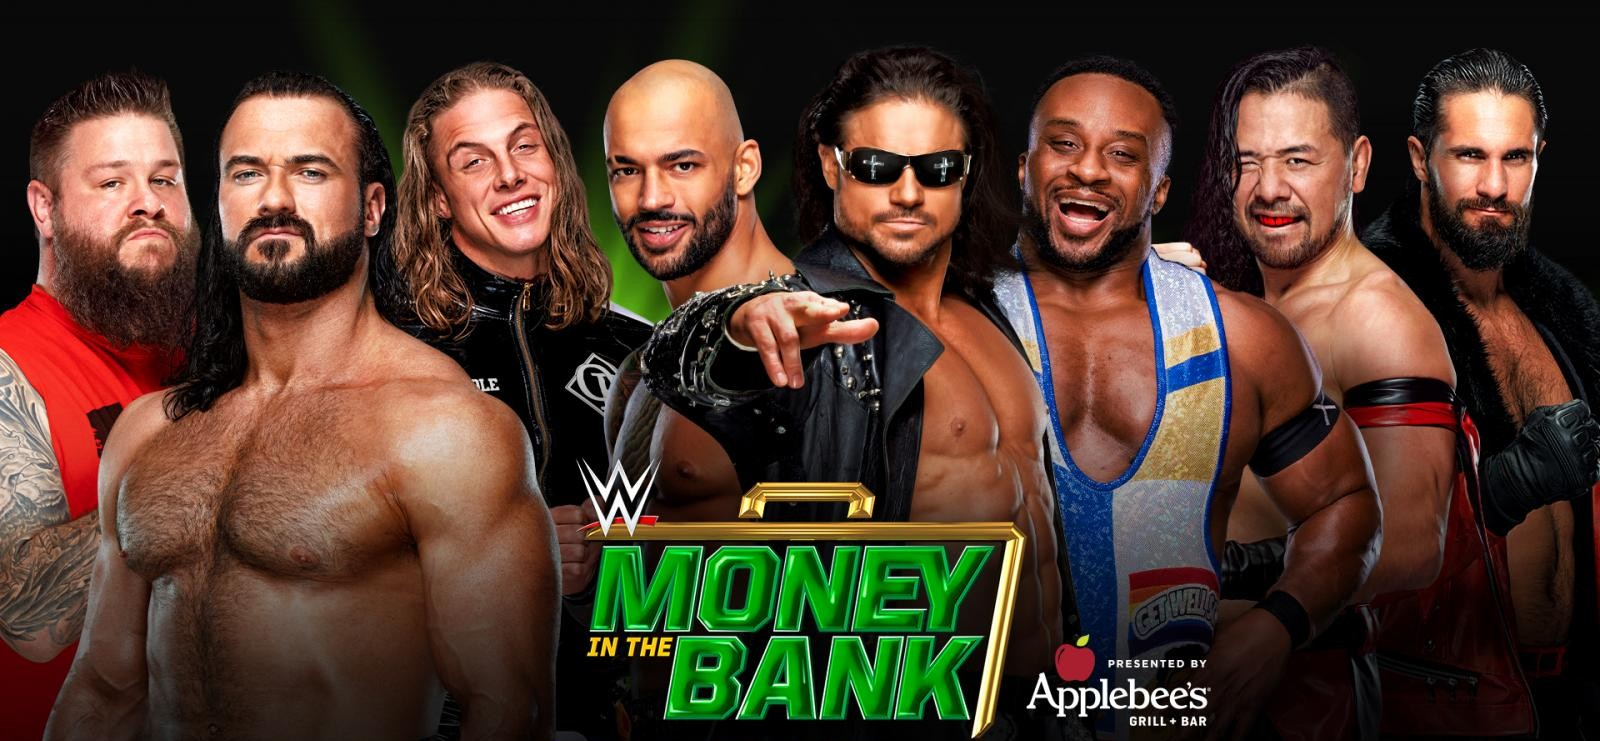 WWE Money in the Bank 2021 match grades results: Big E, Nikki A.S.H capture briefcases, Cena returns